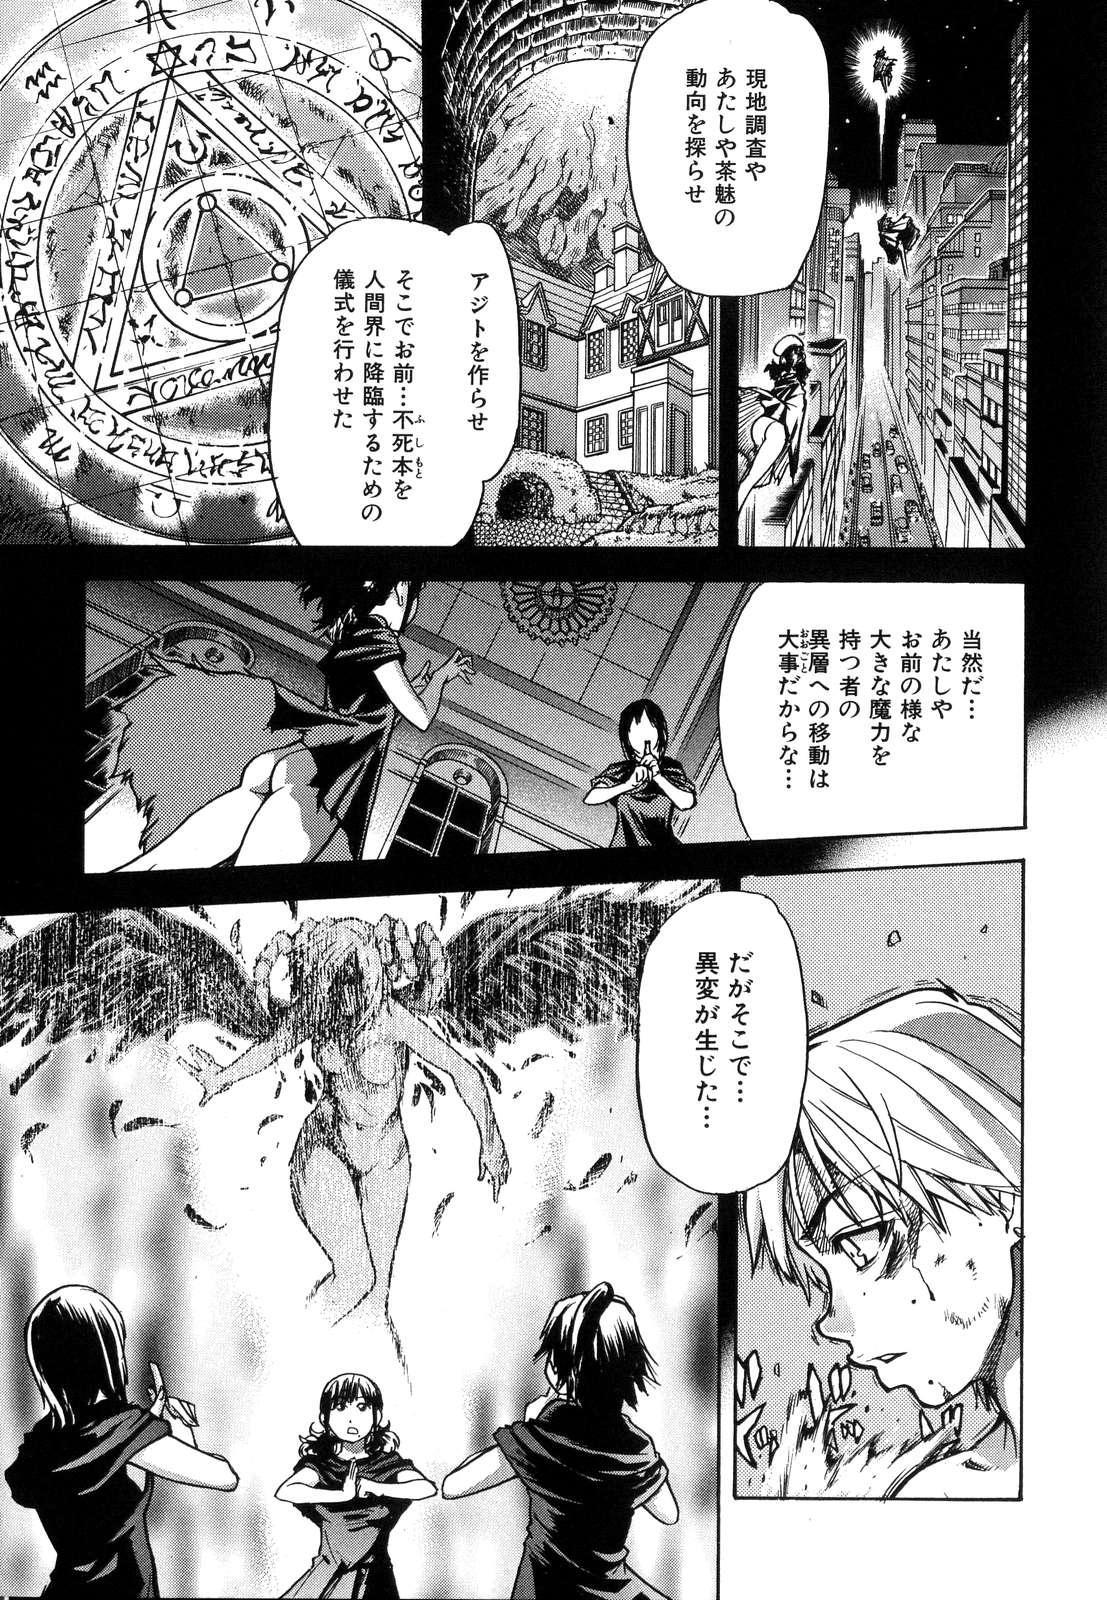 Shining Musume. 6. Rainbow Six 193